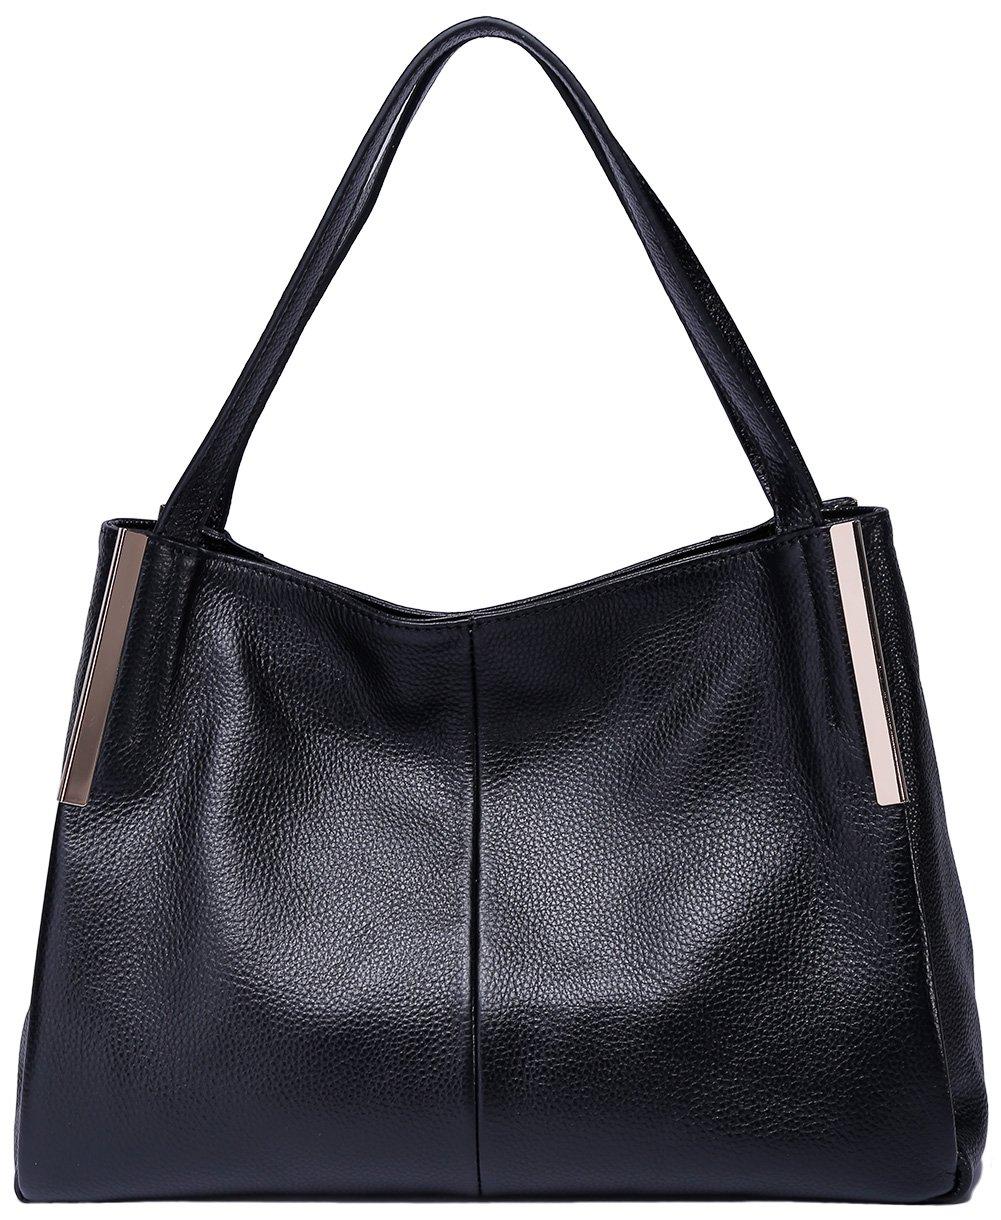 3d0547a917be Amazon.com: BOYATU Leather Handbags Crossbody Shoulder Bags for Women  Elegant Satchel Totes(Black): Boyatu